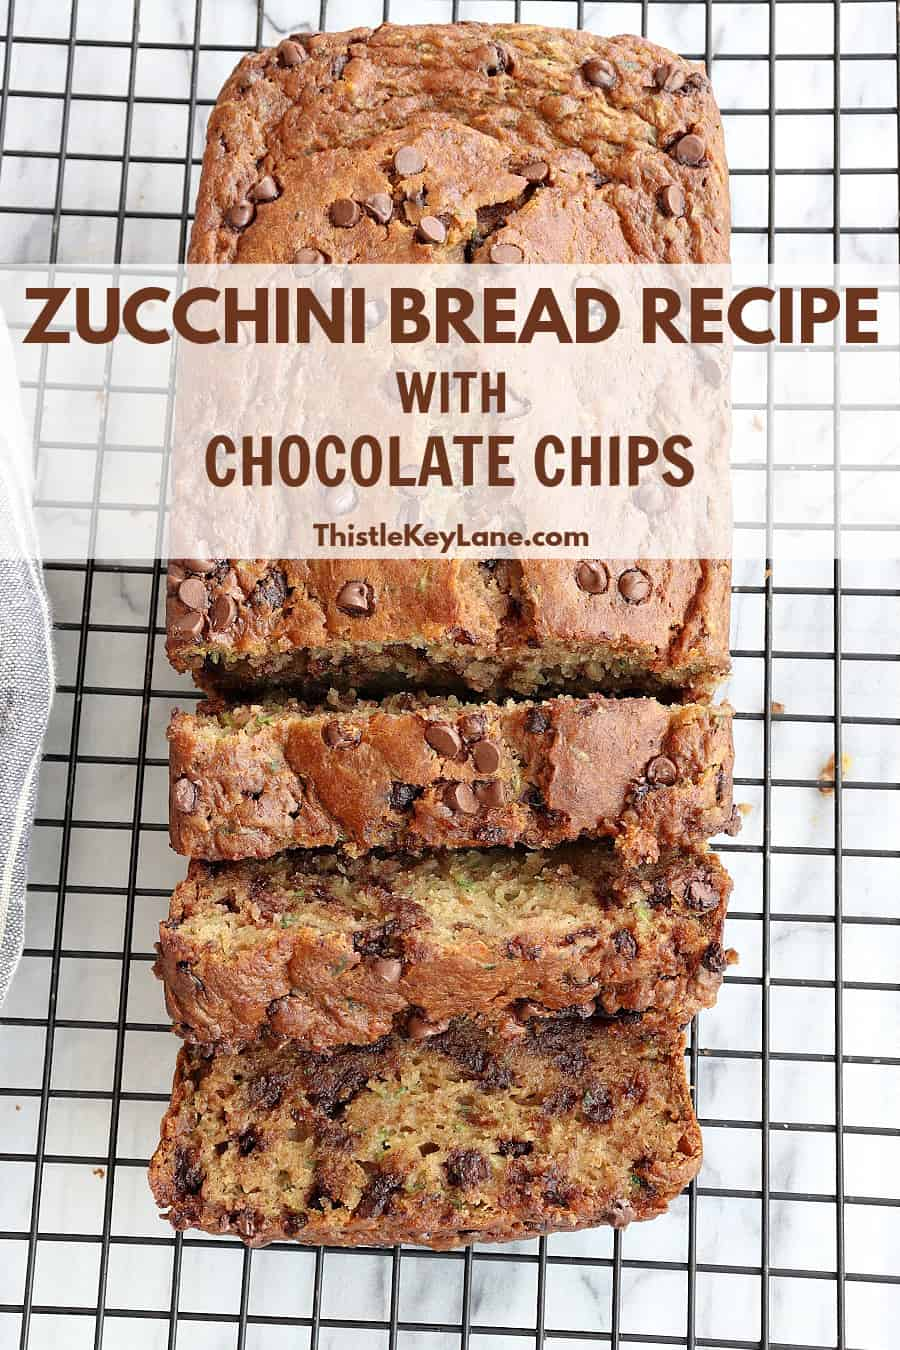 Zucchini Bread Recipe With Chocolate Chips.